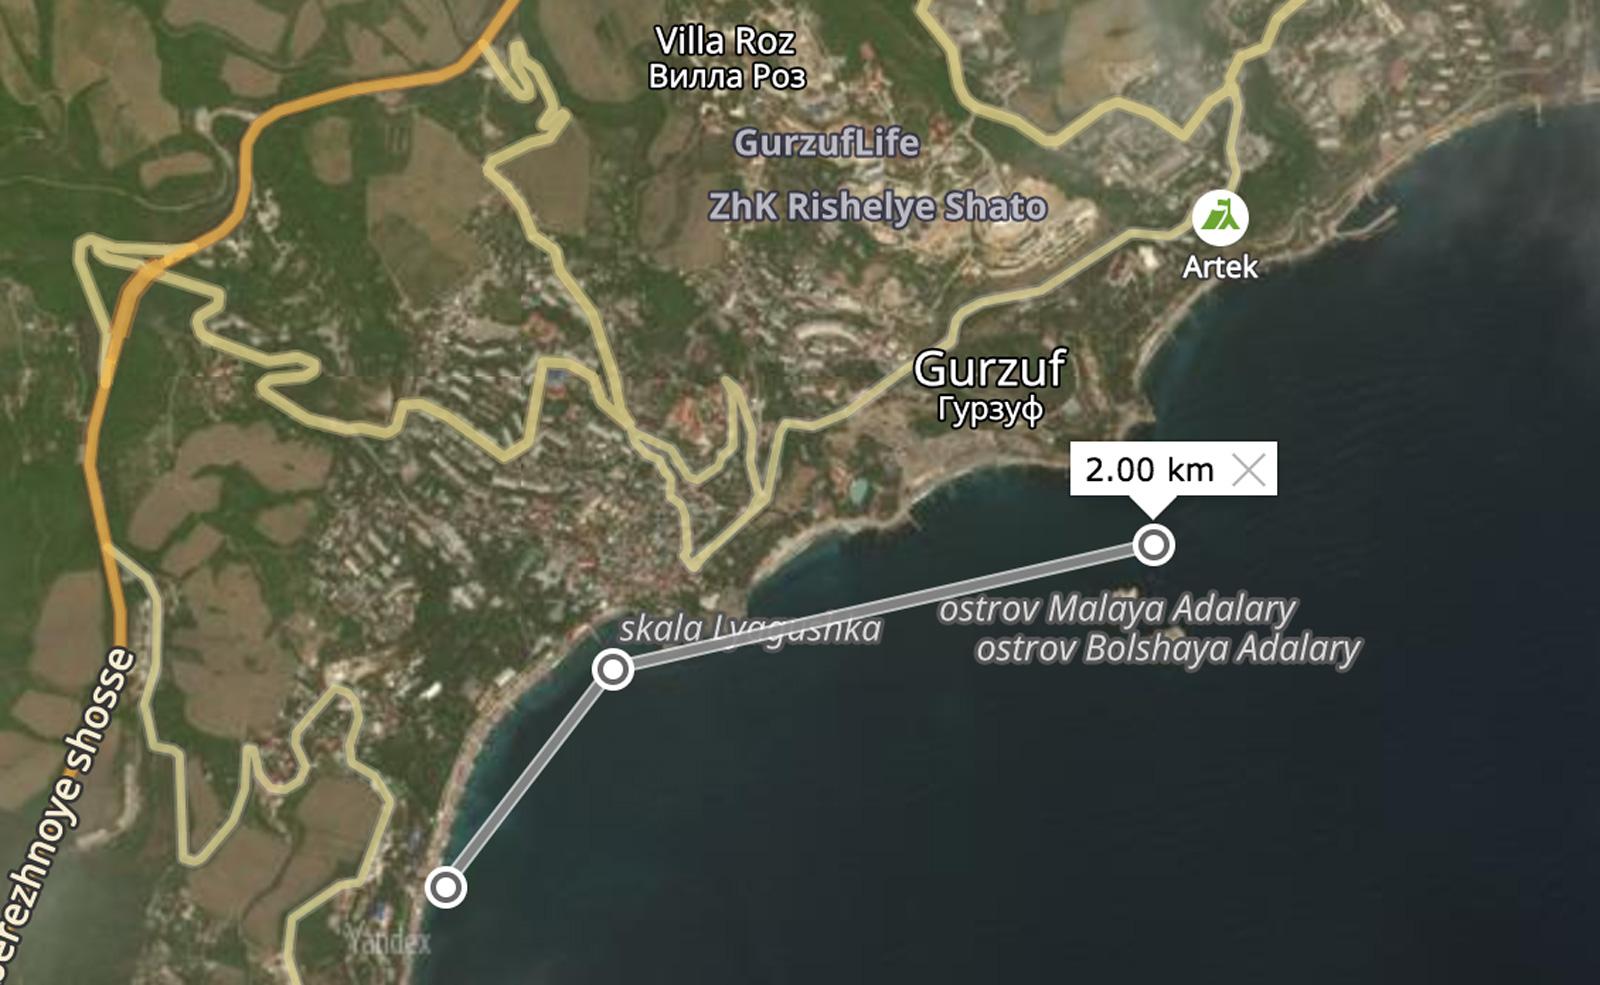 julia-karpacheva-paddleboarding-russia-black-sea-paddle-gps-map-route-2